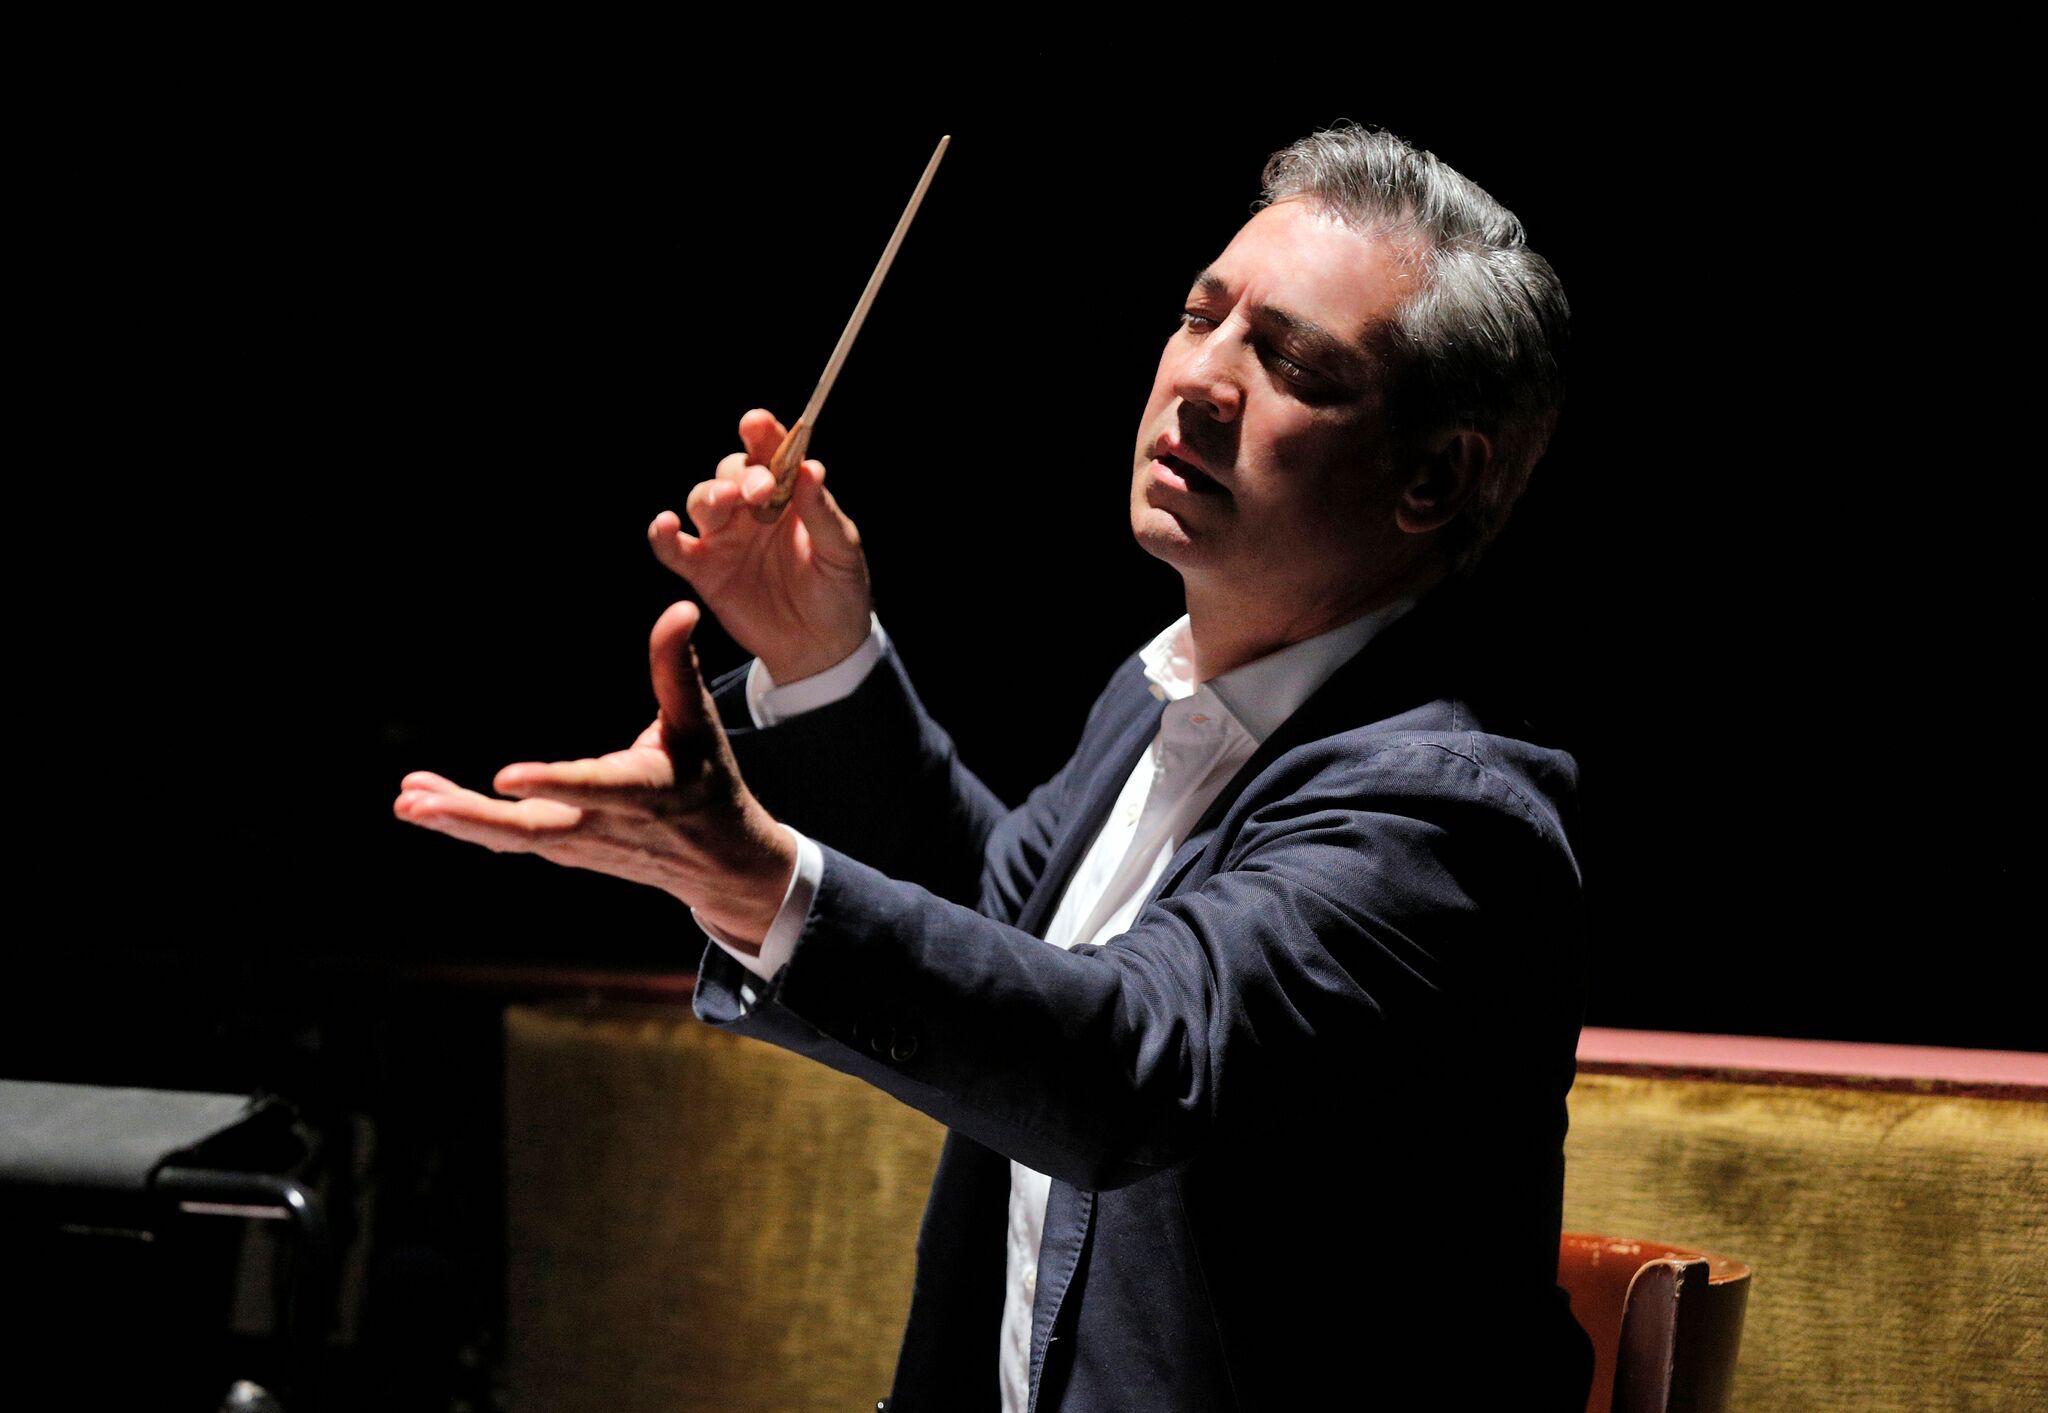 The ball marks the start of Nicola Luisotti's last season with the Opera